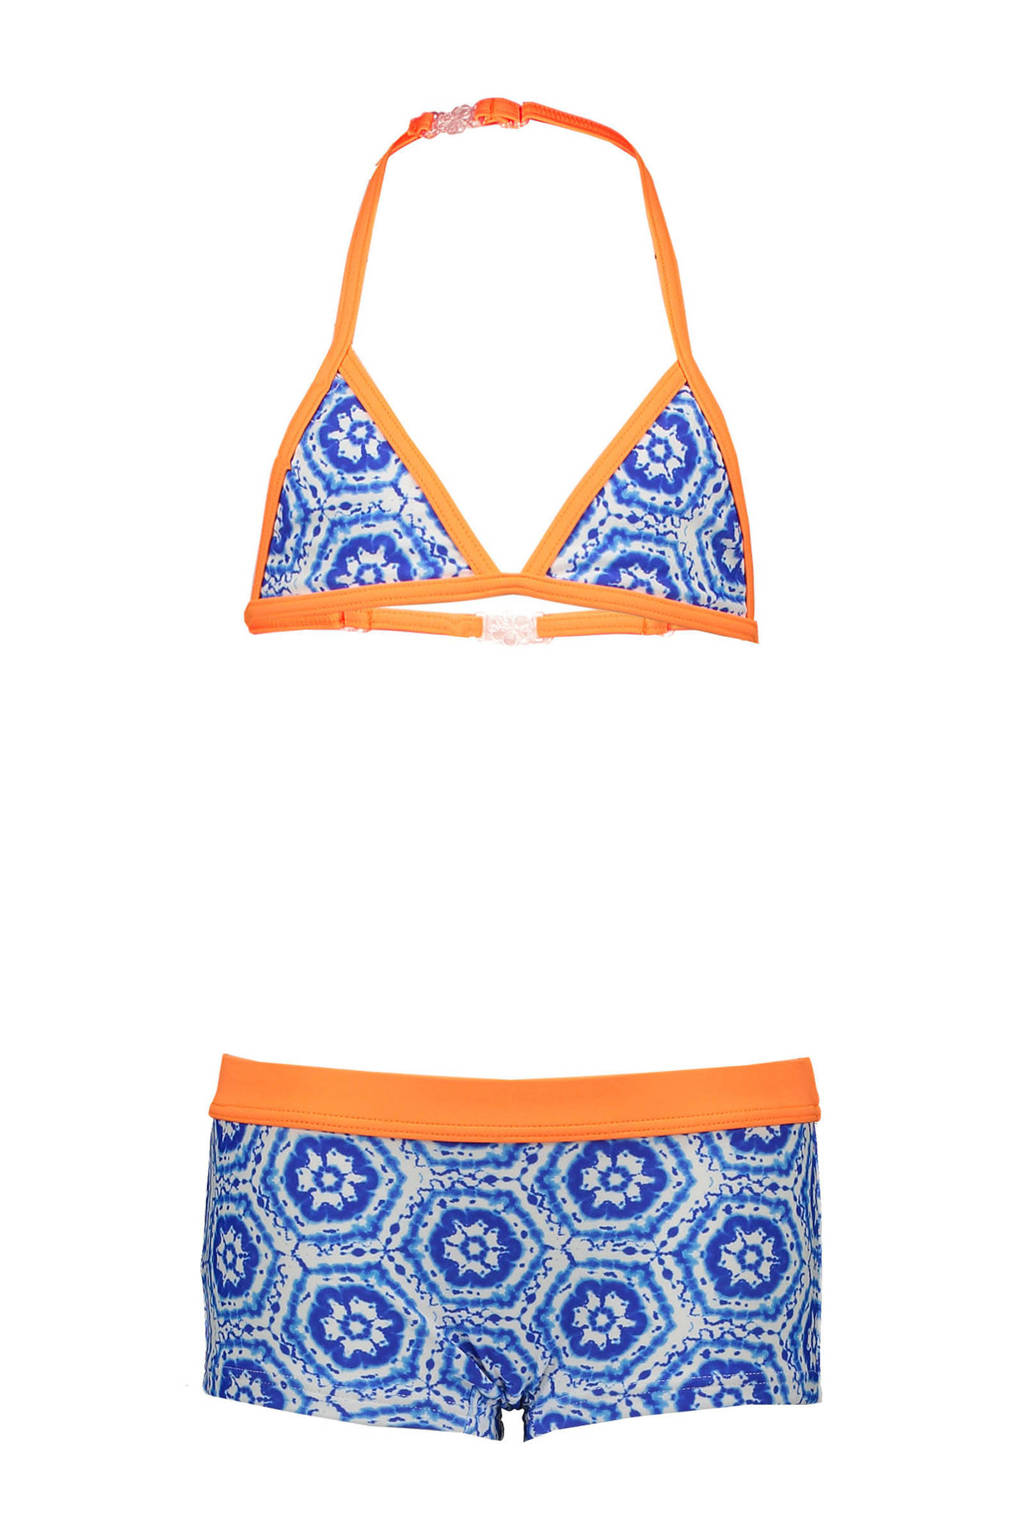 Just Beach triangel bikini met all over print blauw/oranje, Blauw/wit/oranje